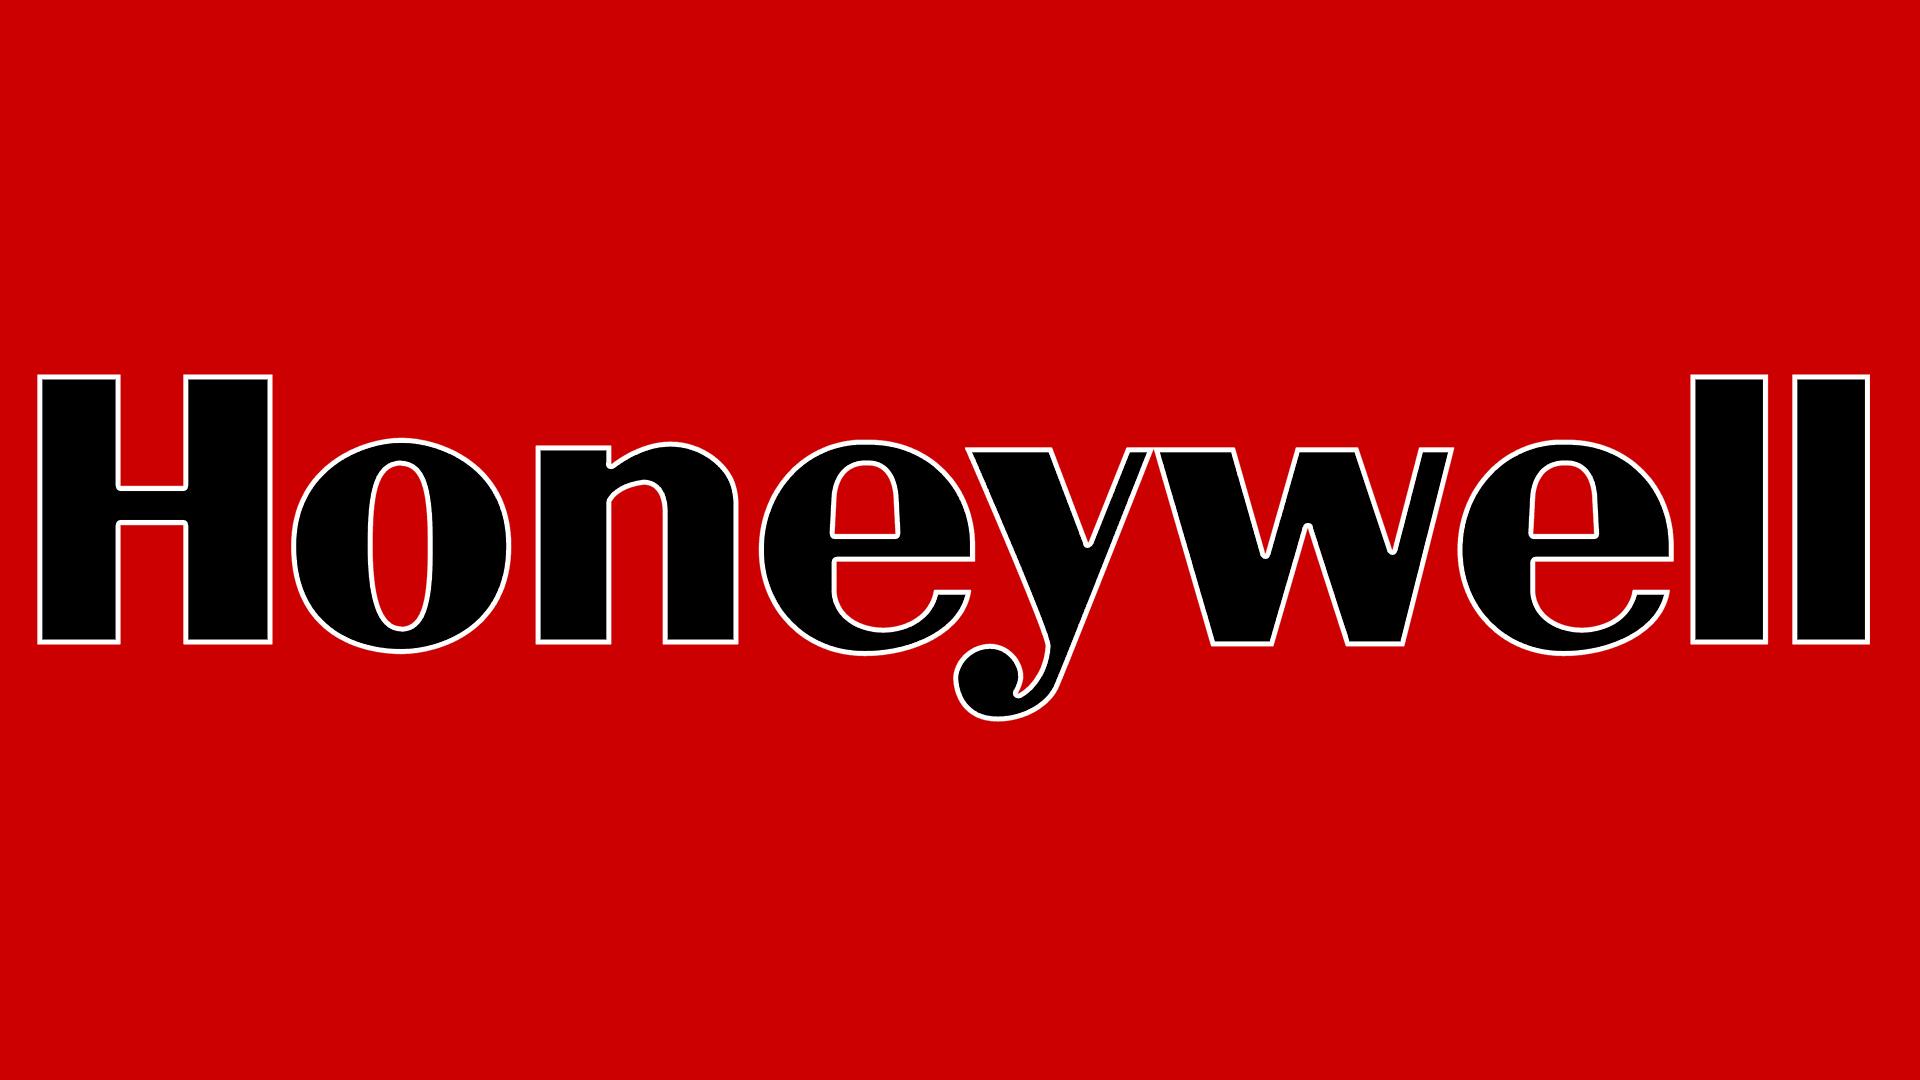 Honeywell Logo, Honeywell Symbol, Meaning, History and ...